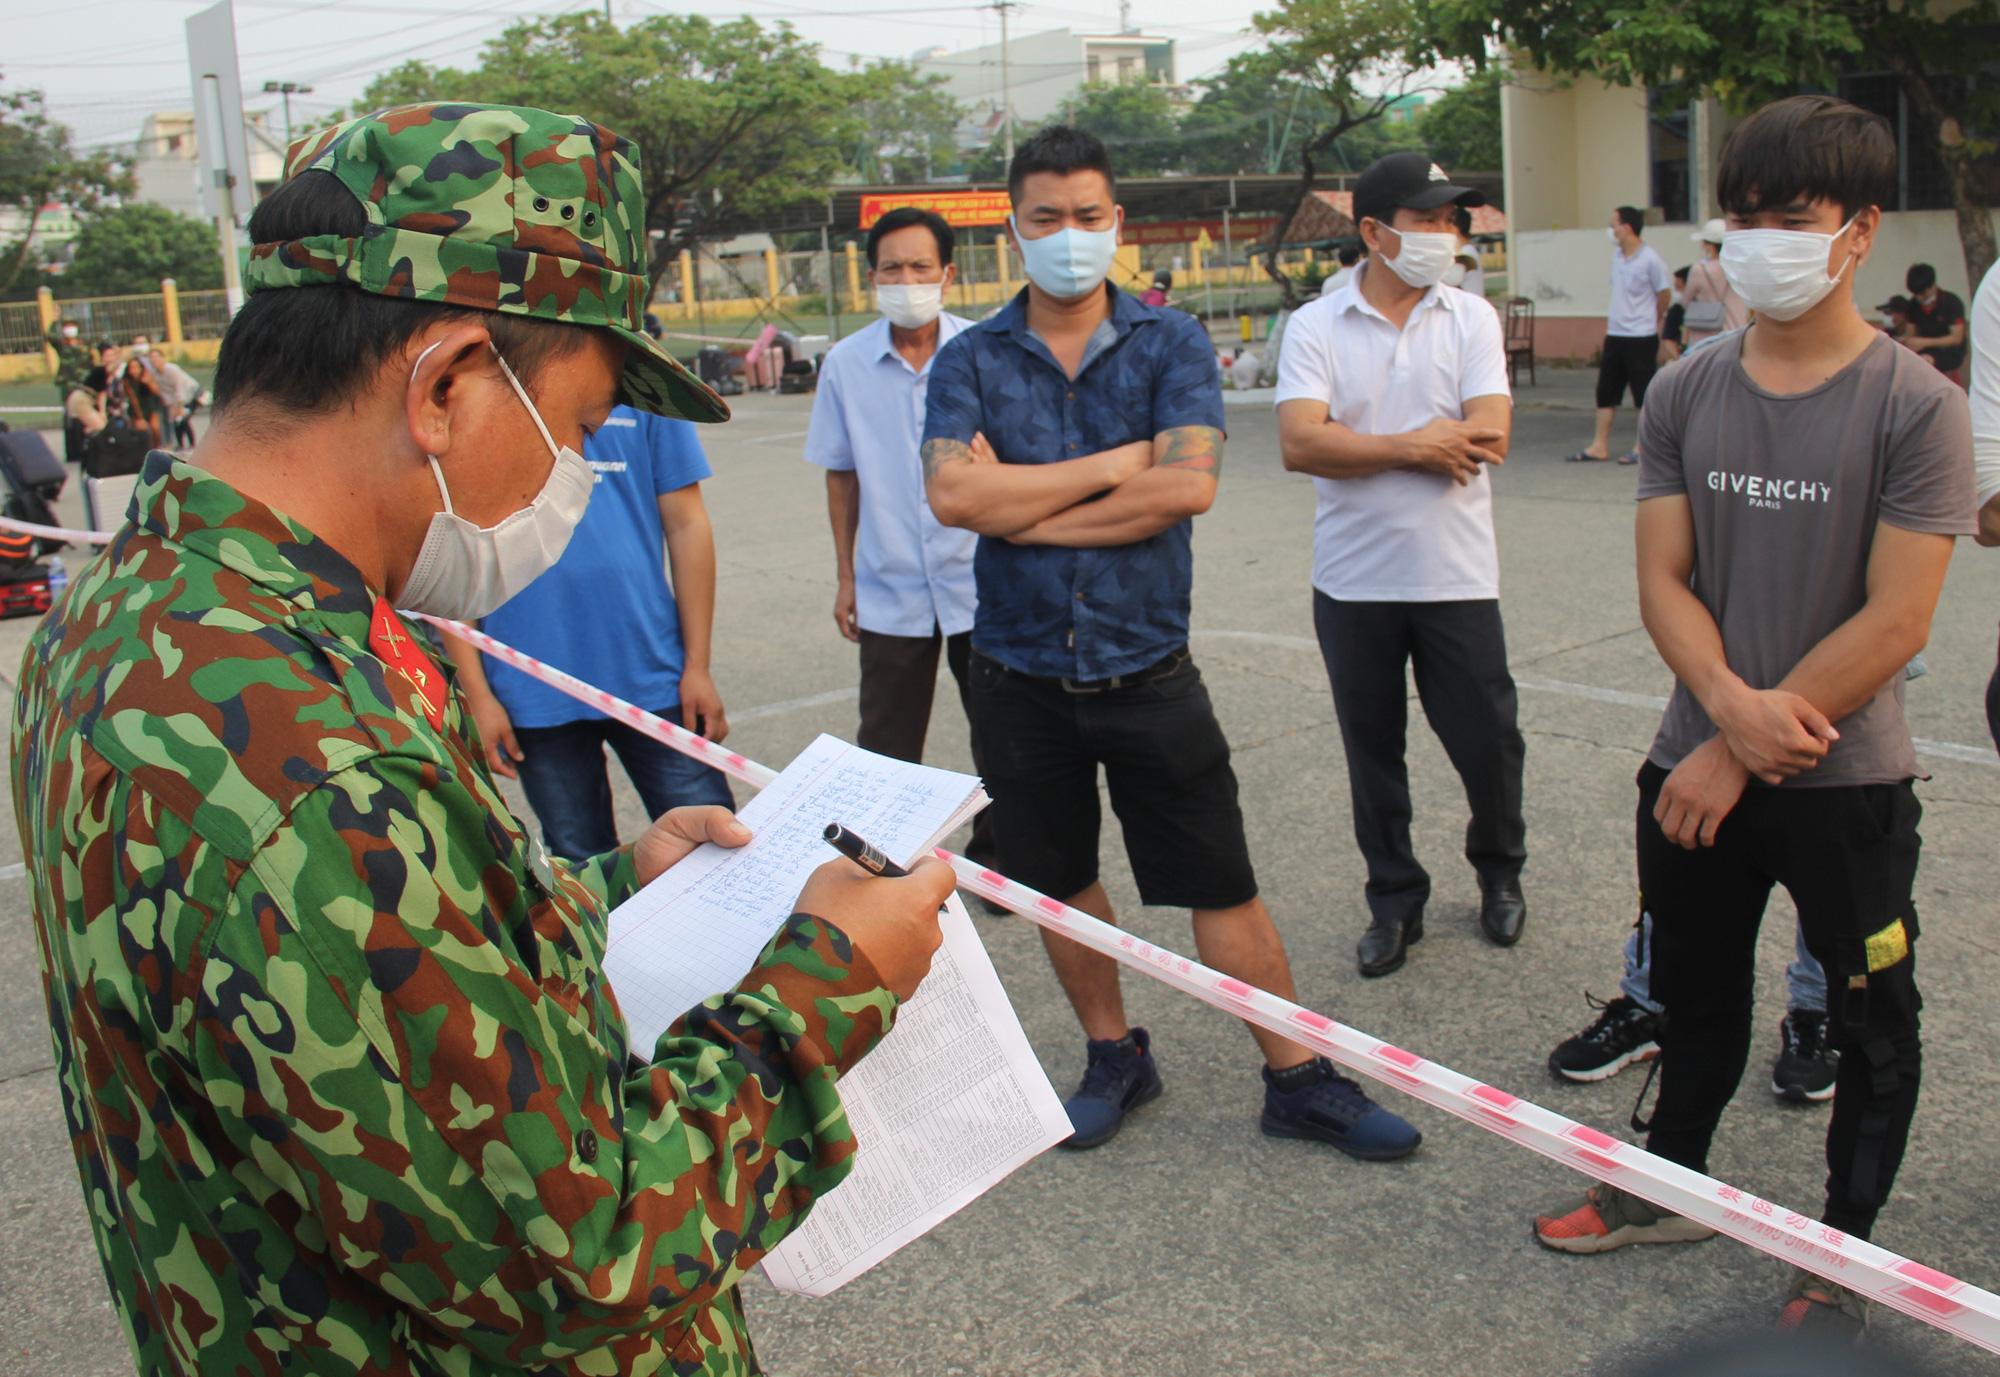 340 stranded Vietnamese repatriated on flight from S.Korea